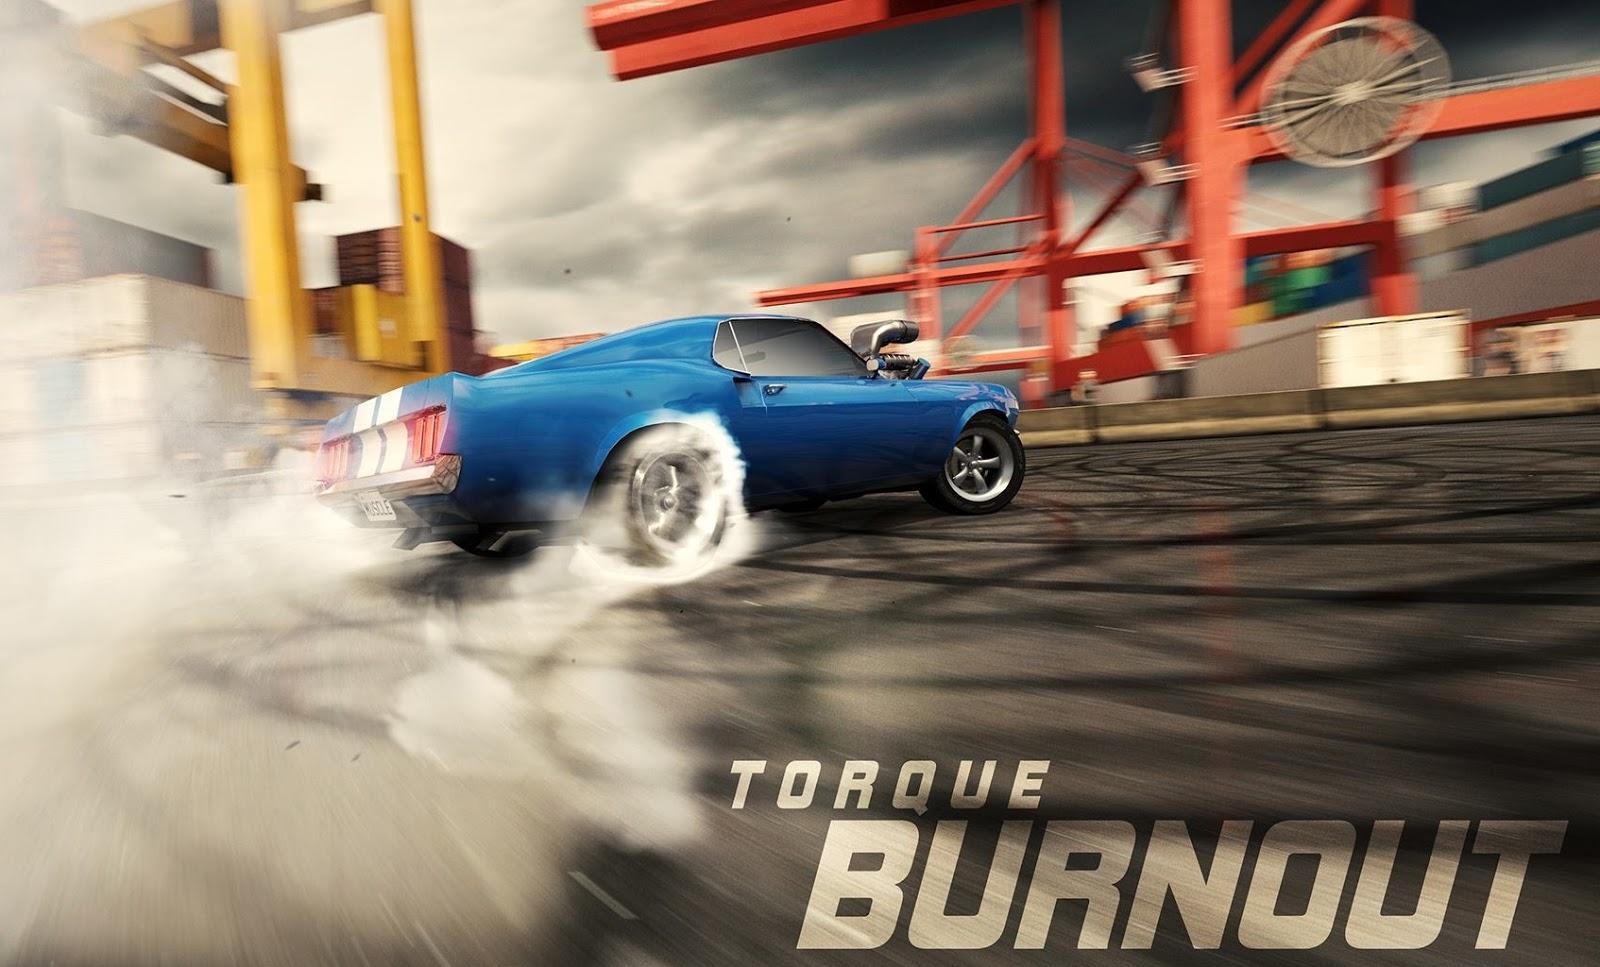 ���� Torque Burnout v1.7.1 ����� �����